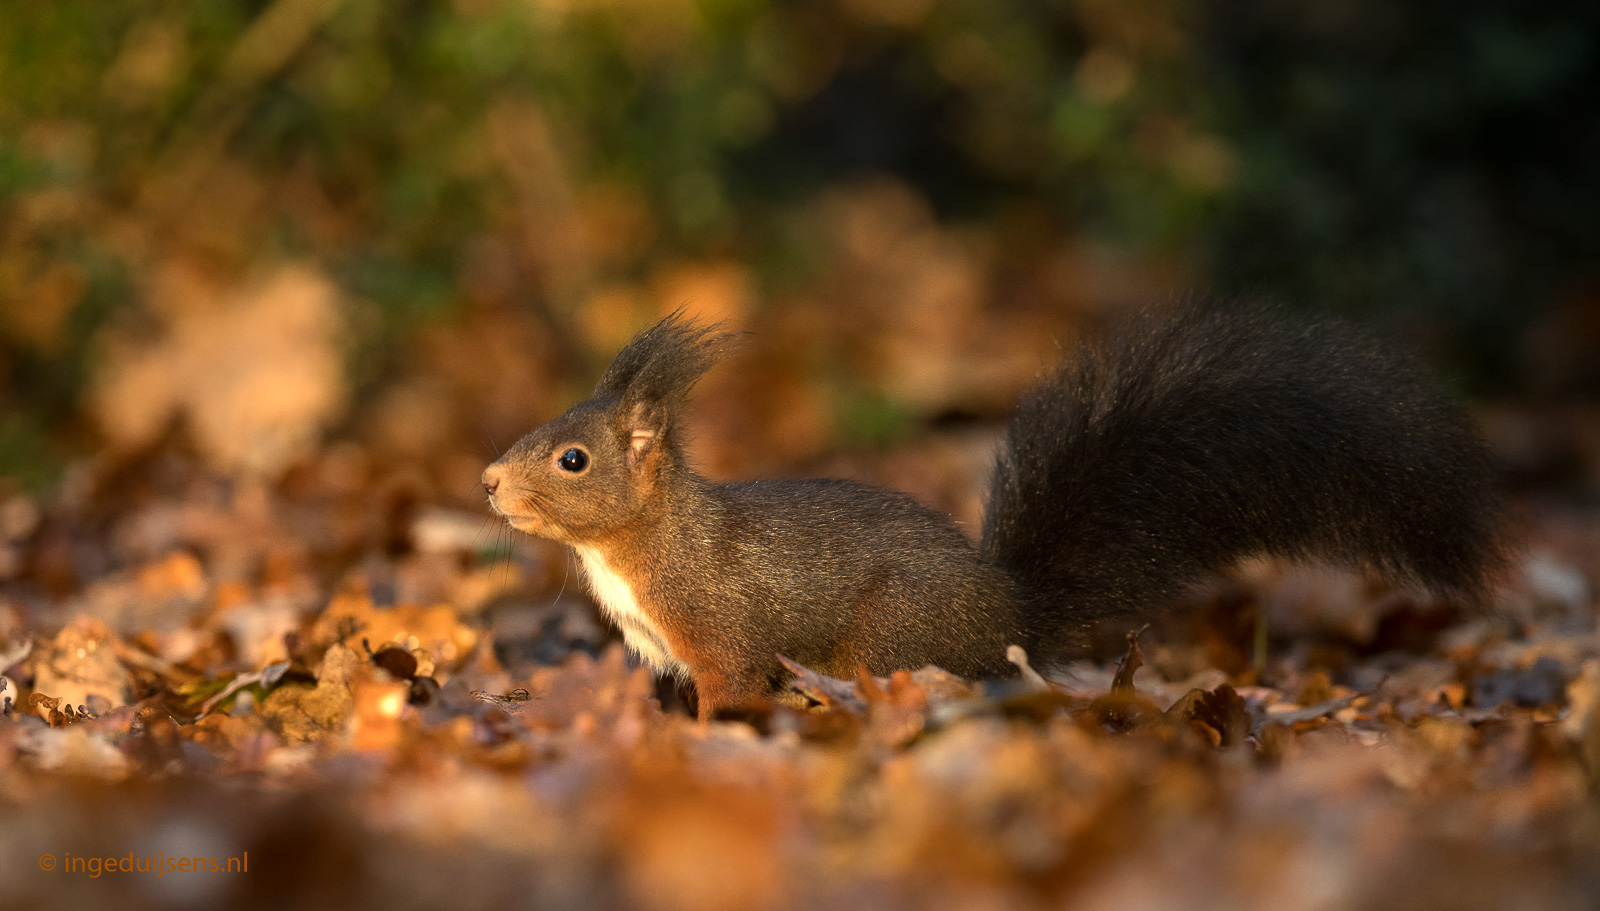 Herfstsfeer Eekhoorn